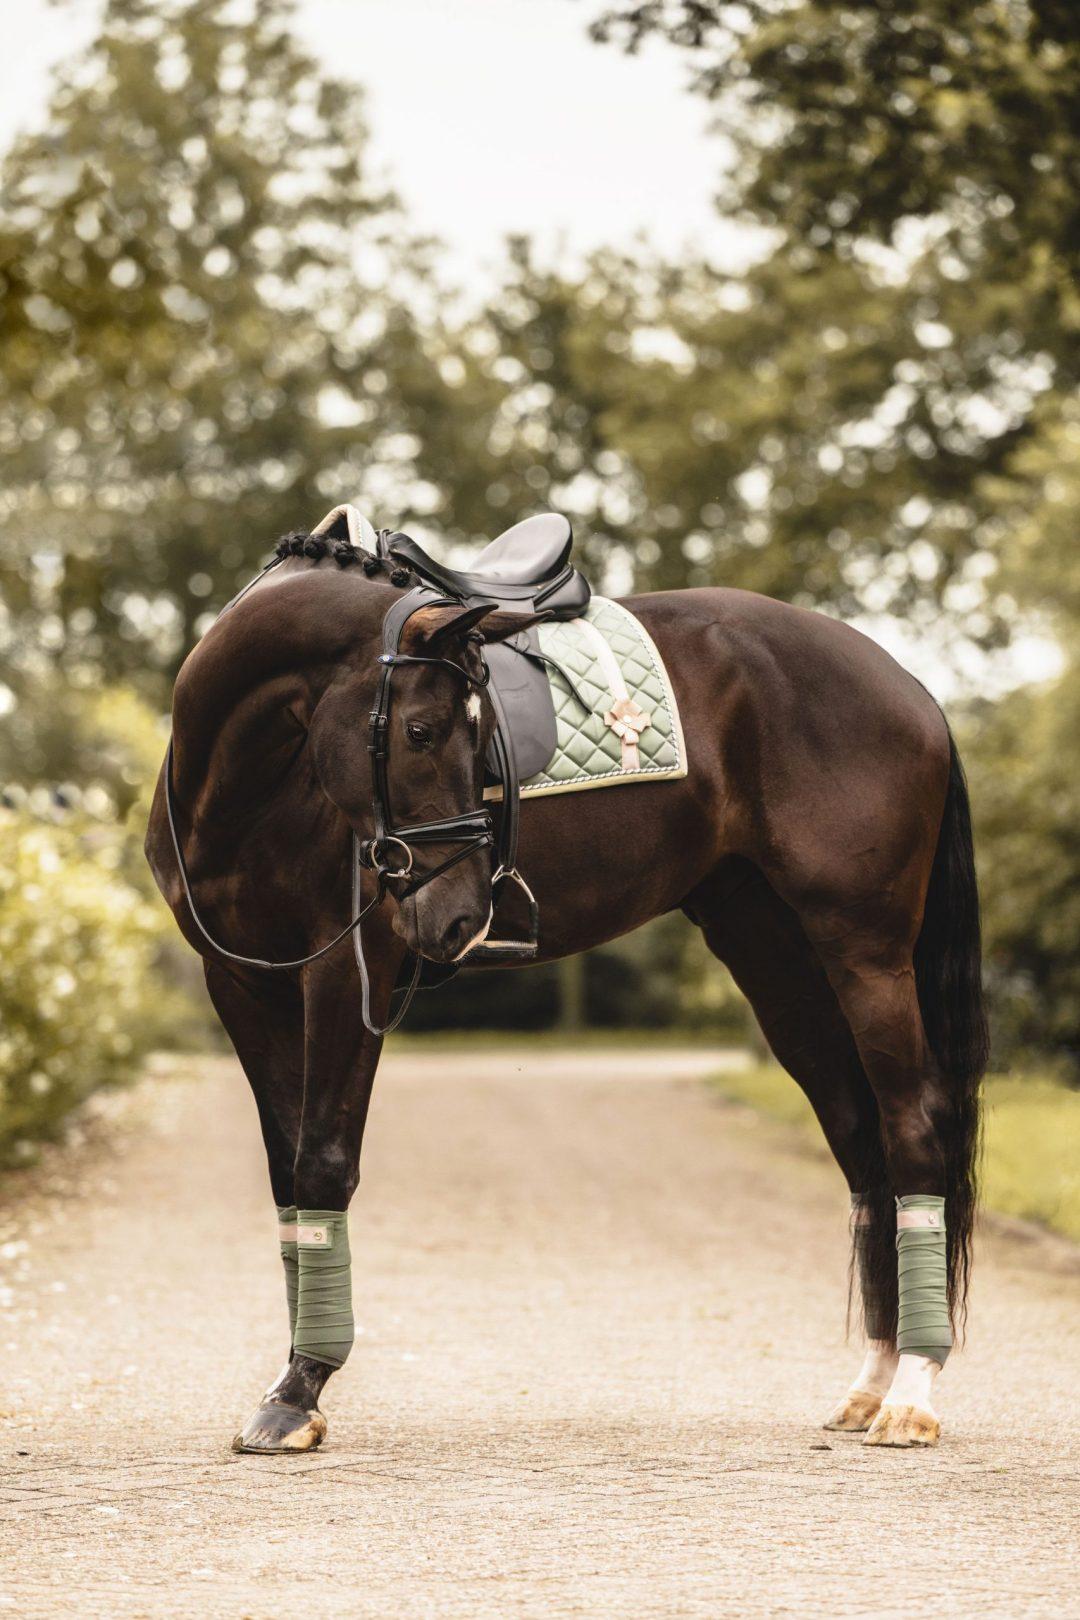 polo saddle pads matchy matchy